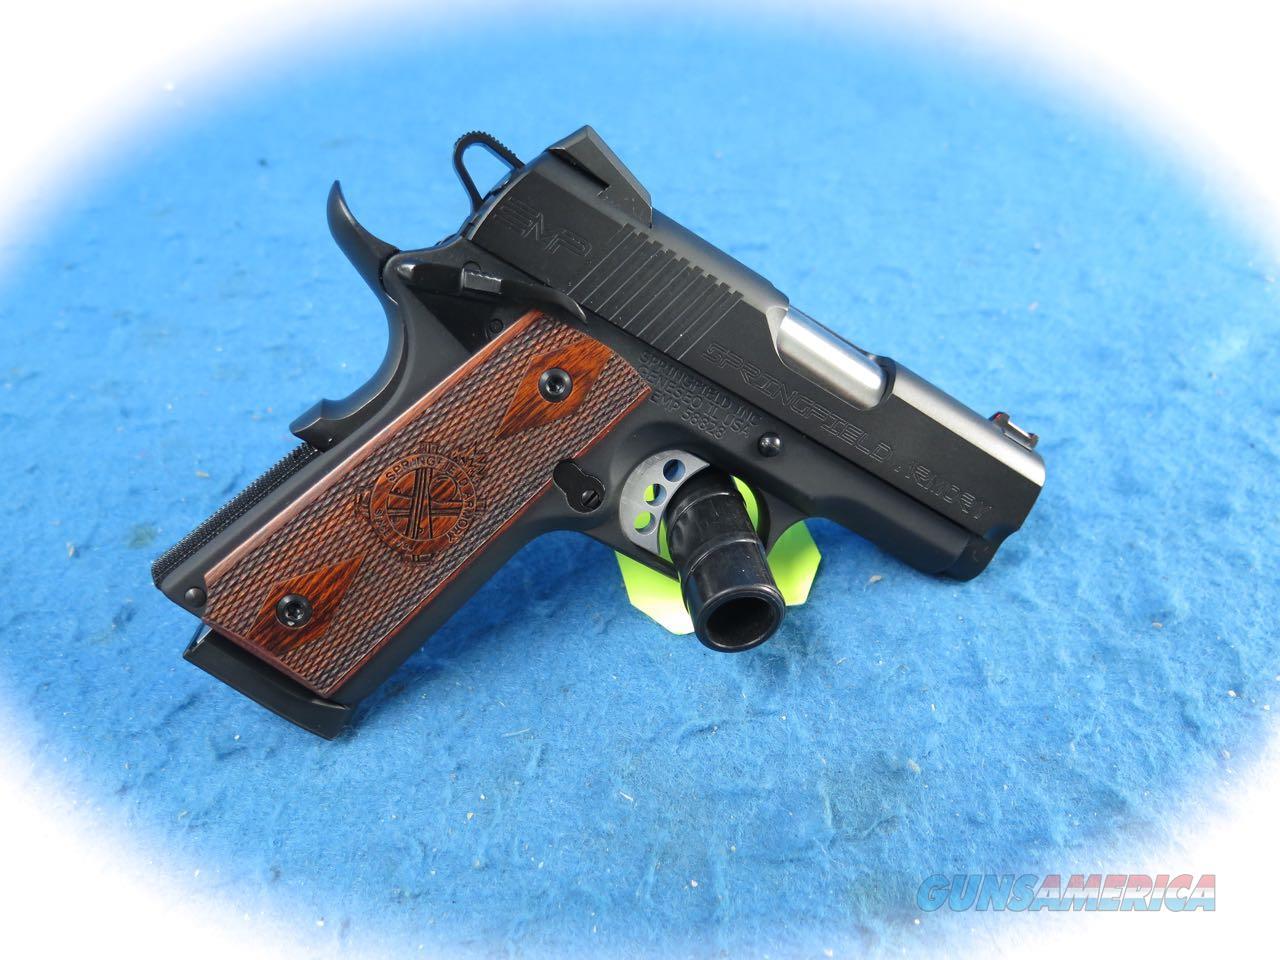 Springfield Armory EMP 9mm Semi Auto Pistol Model PI9208L **New**  Guns > Pistols > Springfield Armory Pistols > 1911 Type